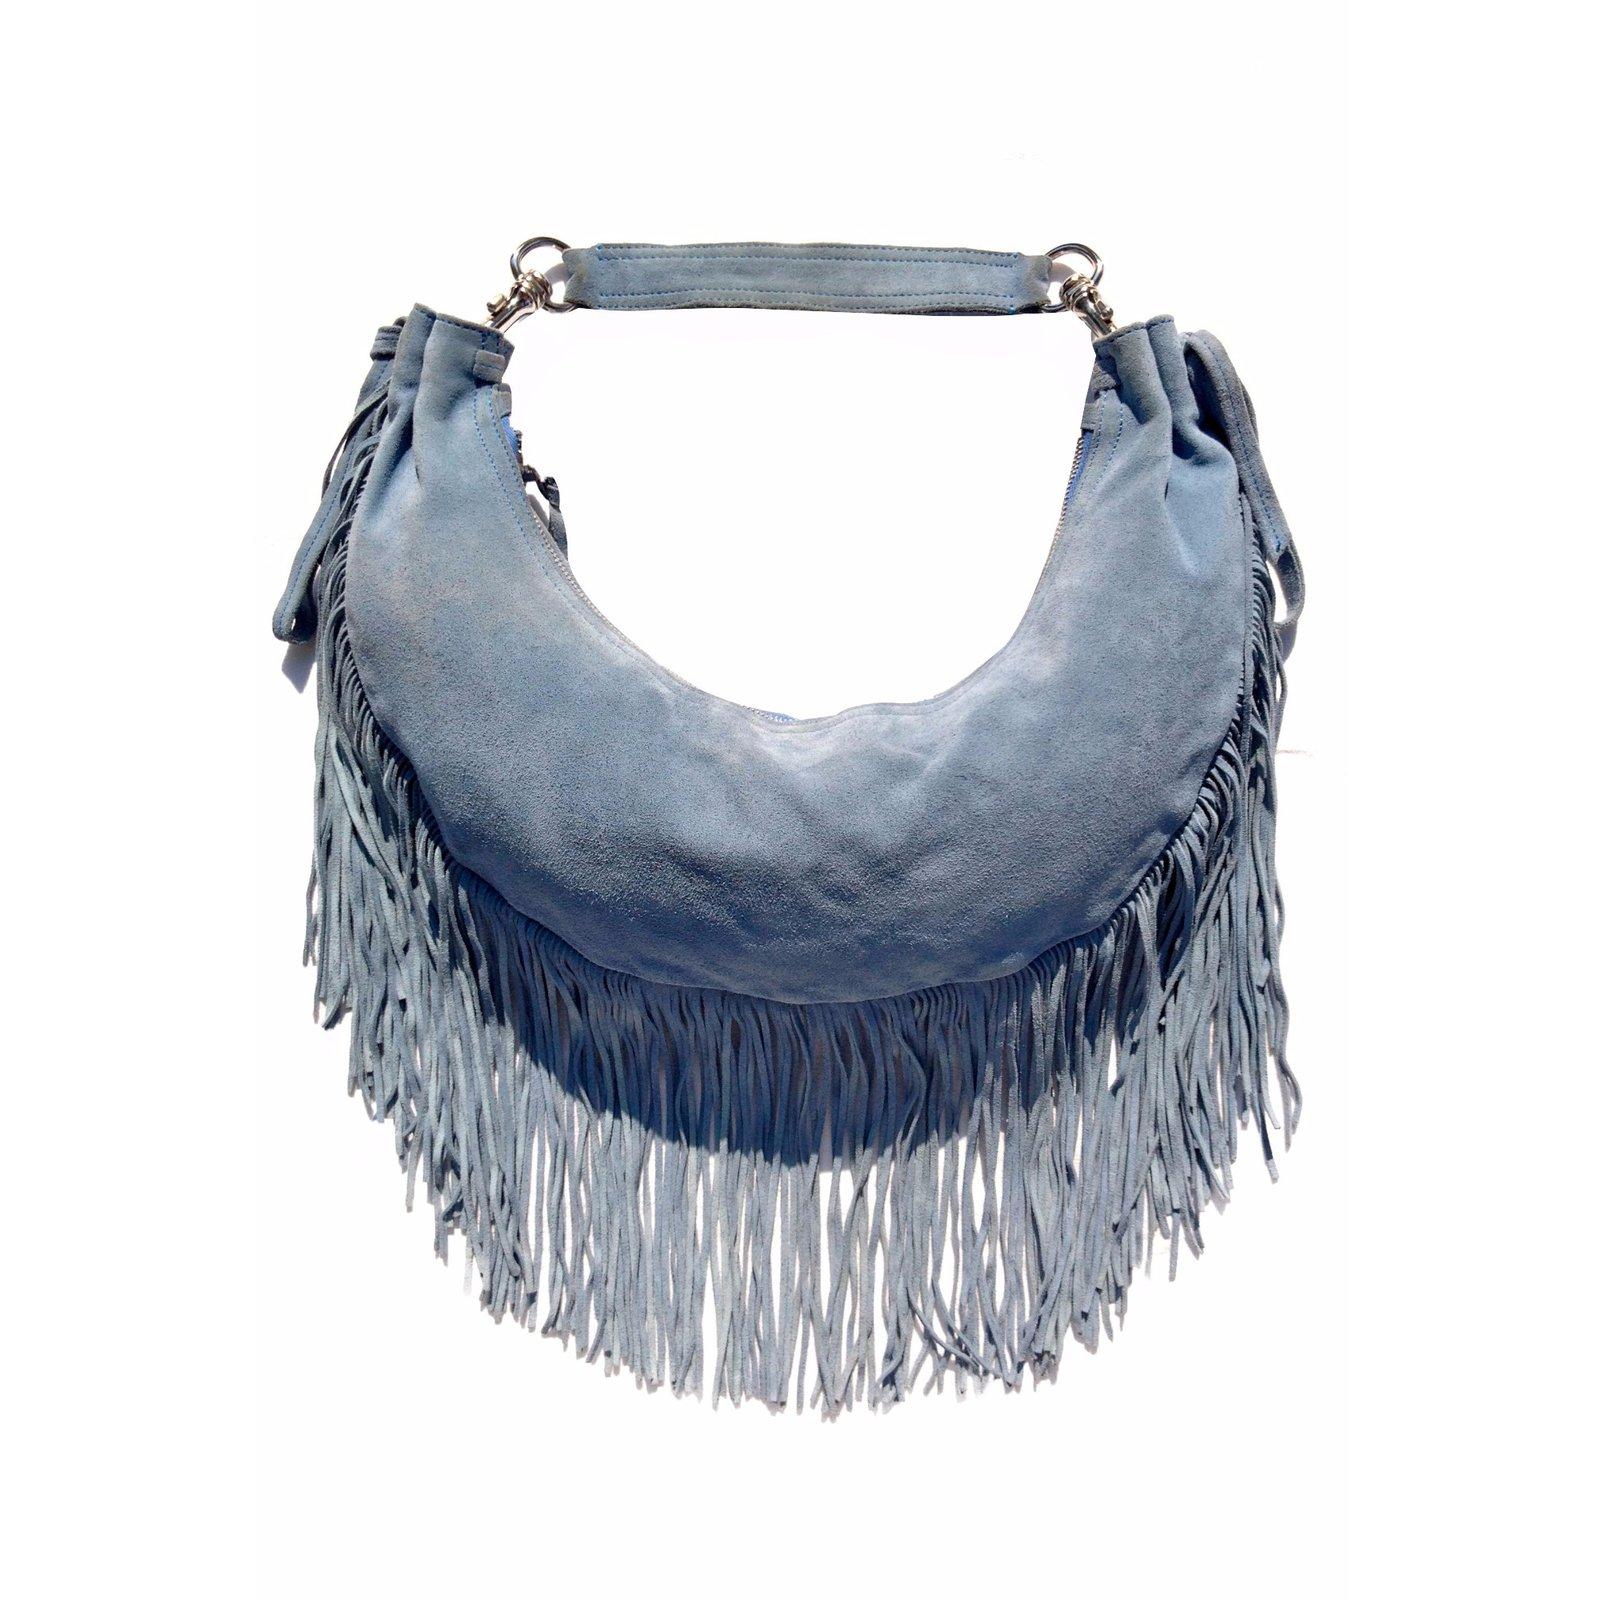 La Maison De La Suede handbags